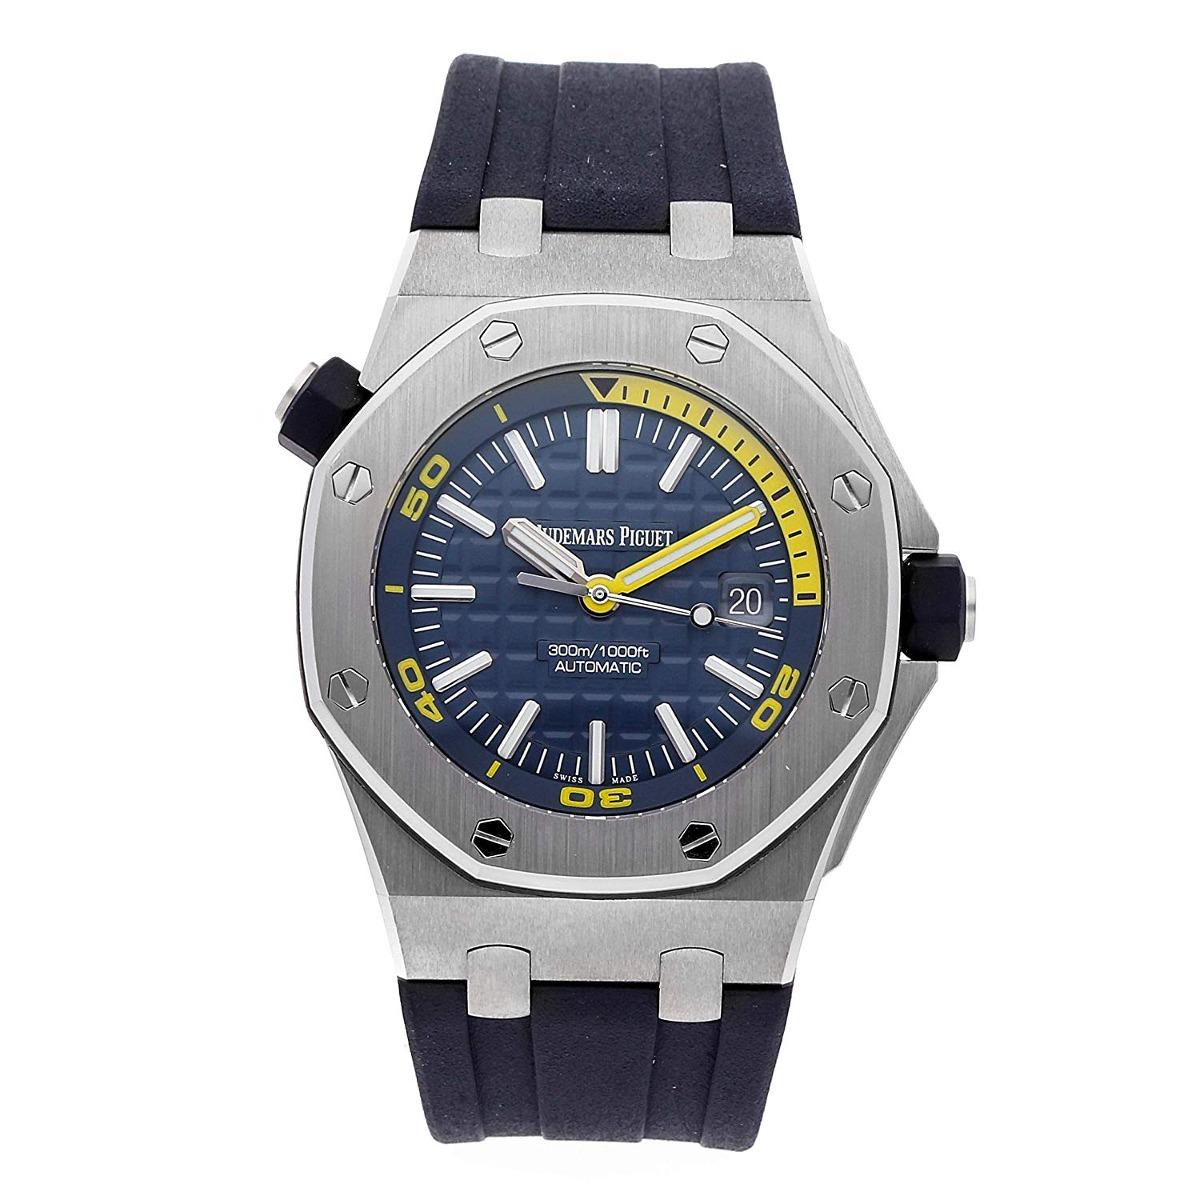 67f89c07c28 relógio audemars piguet royal oak offshor - 221640. Carregando zoom.